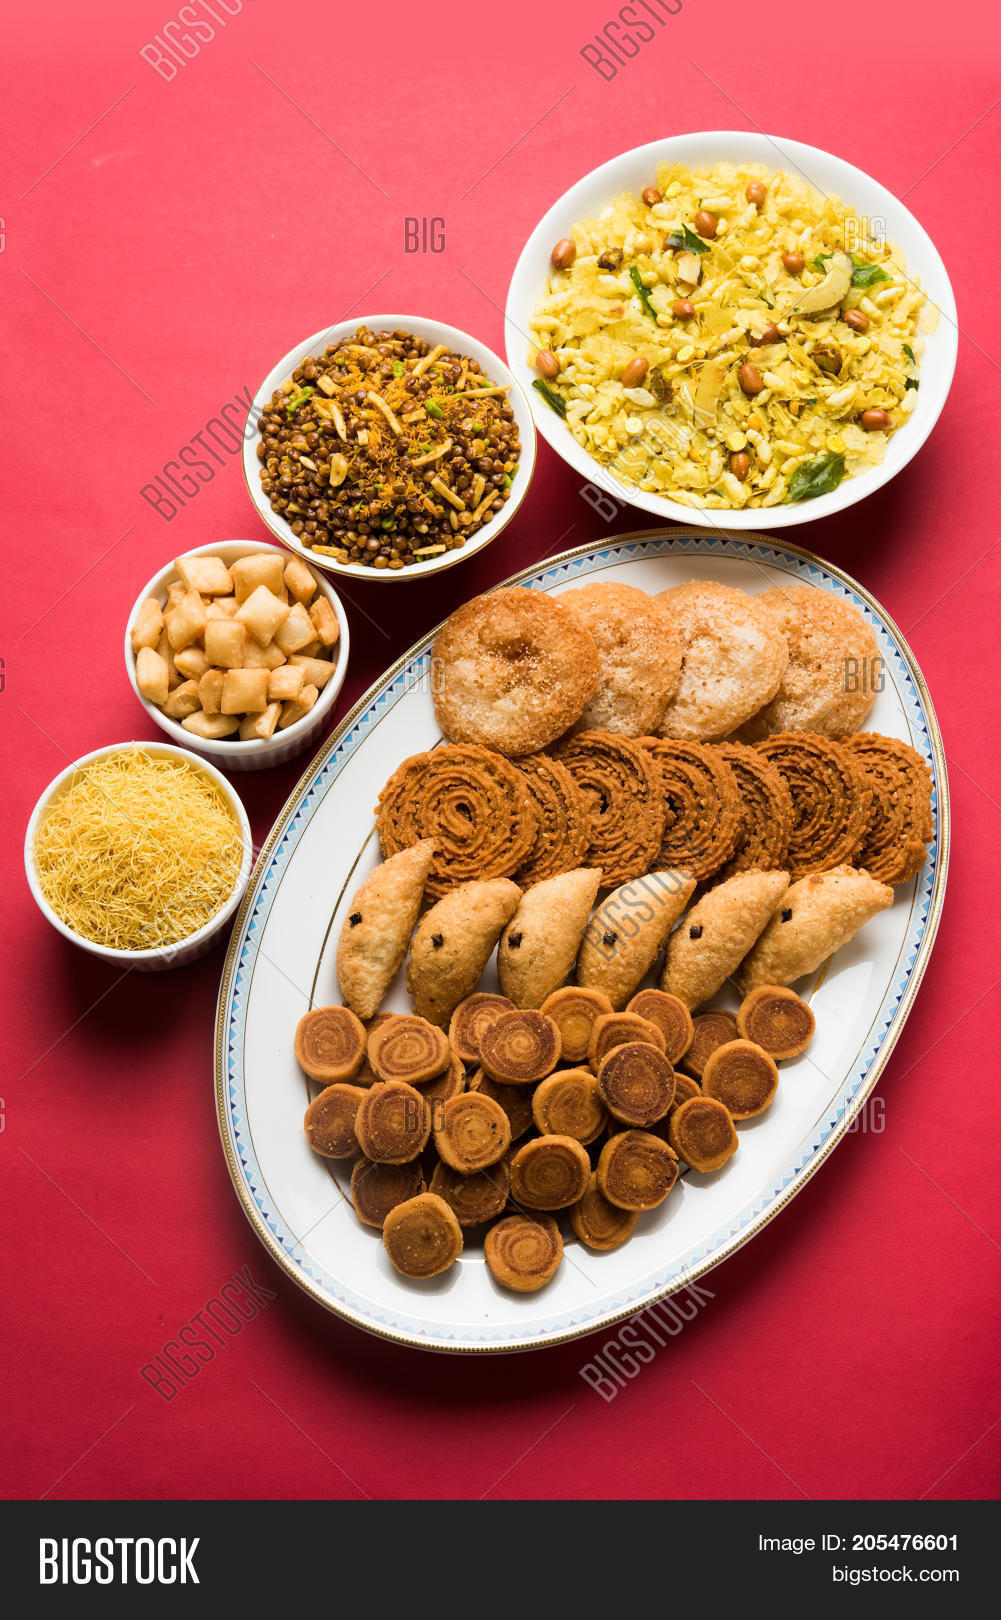 Stock photo diwali food diwali image photo bigstock stock photo of diwali food or diwali snacks or diwali sweets like anarsa bakarvadi forumfinder Image collections